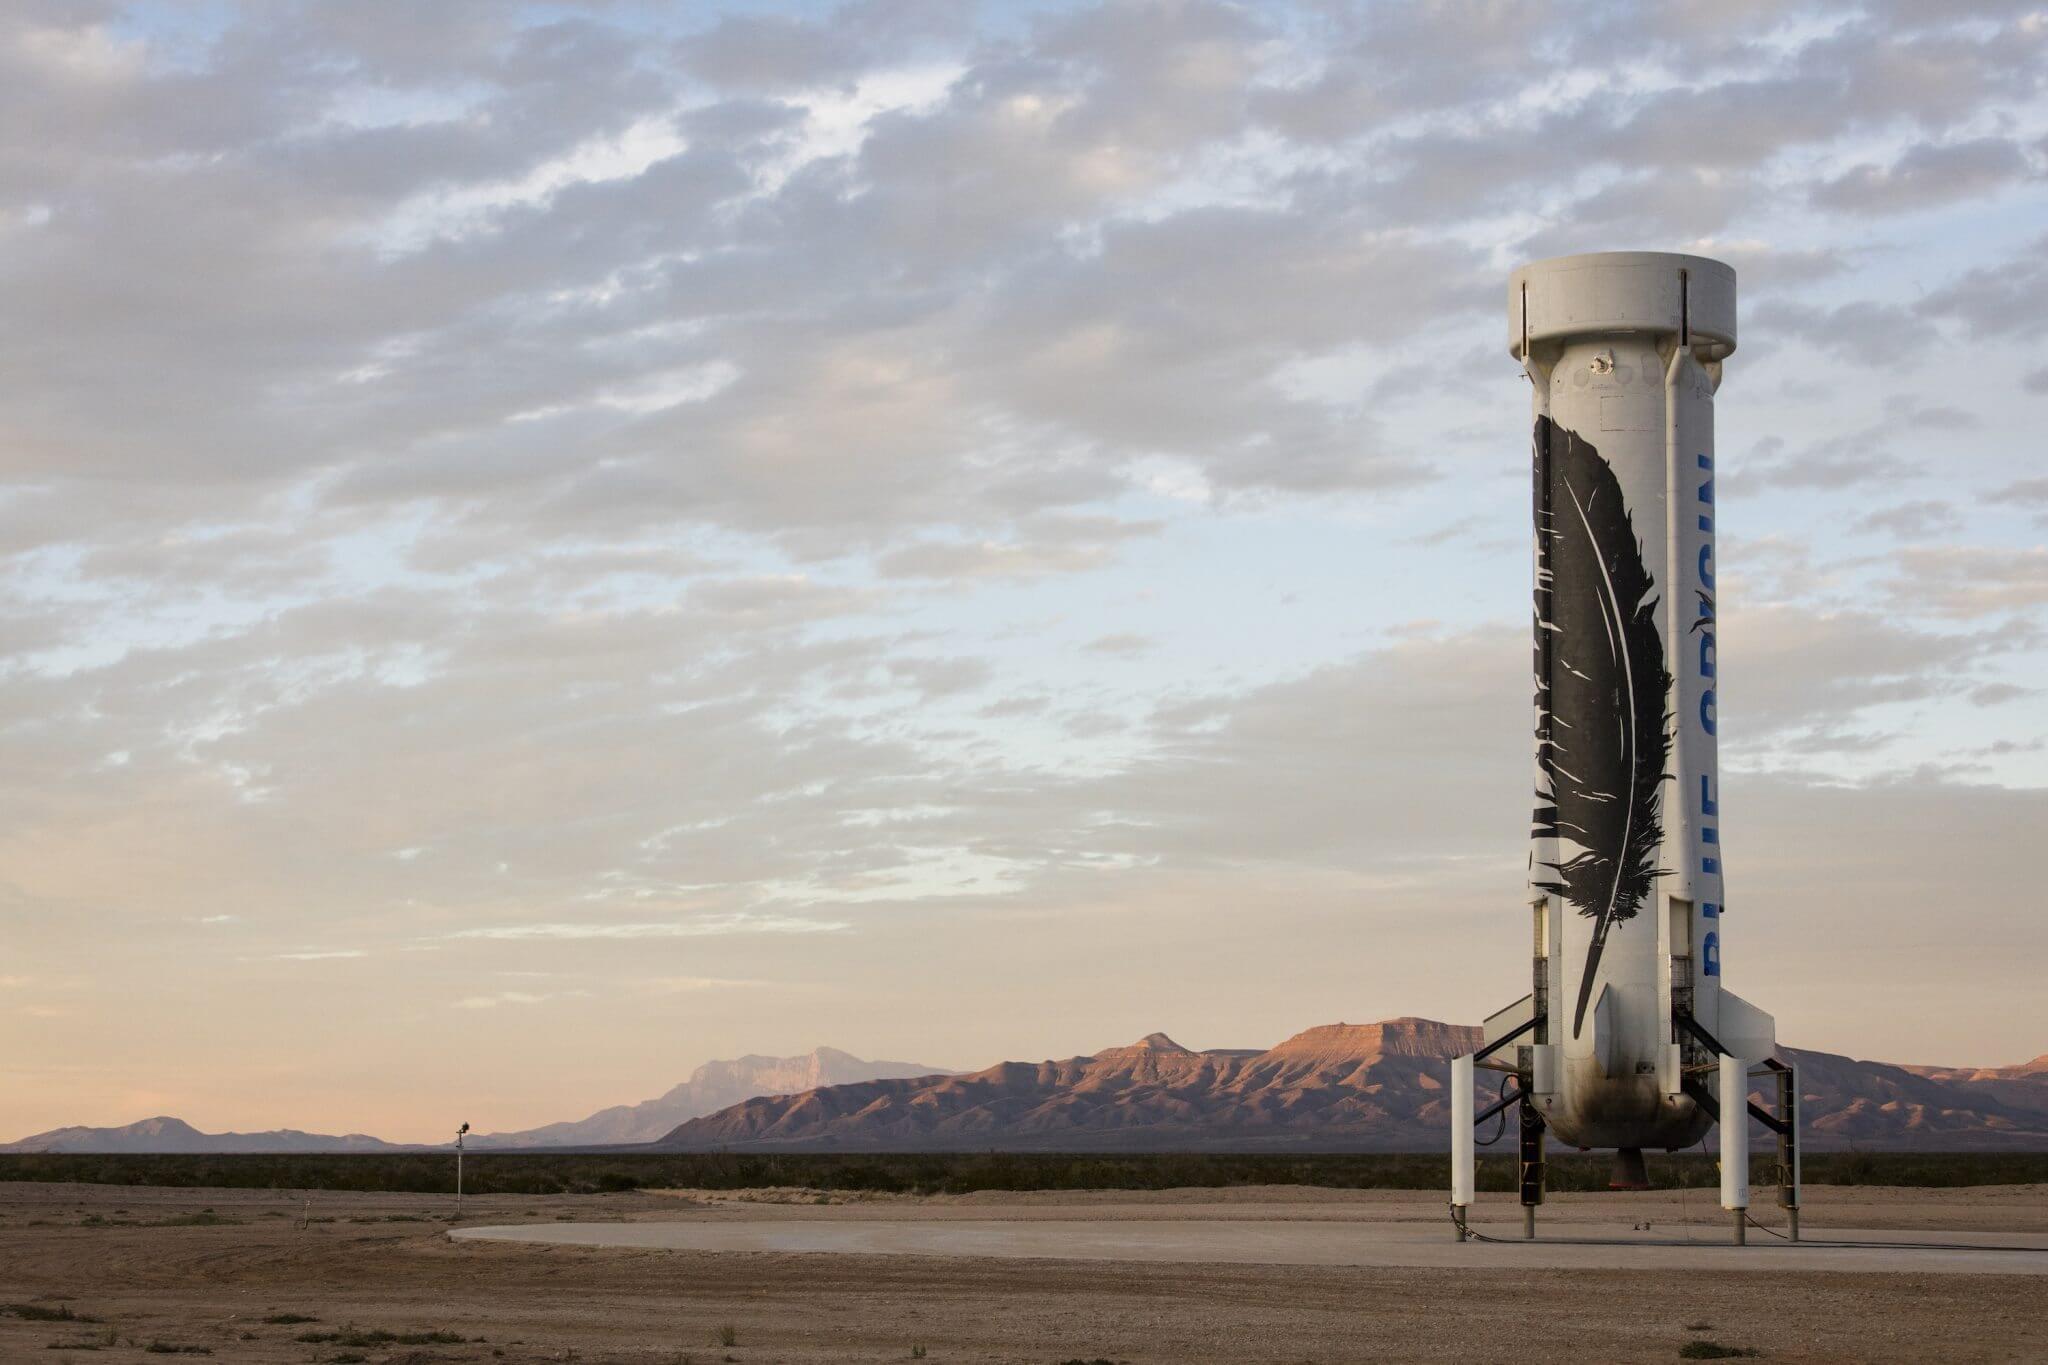 smt bezos capa - Foguete de Jeff Bezos sai na frente na batalha da Corrida Espacial do século XXI